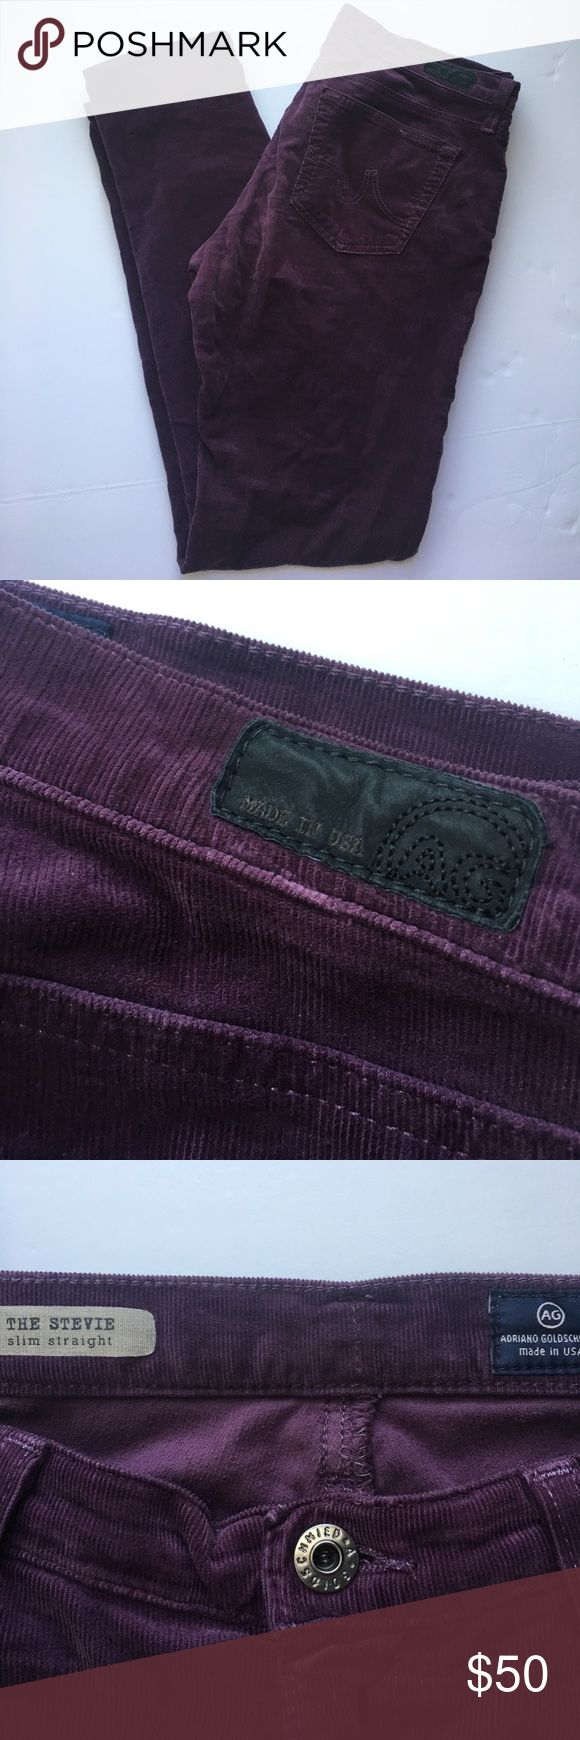 Selling this Adriano Goldschmied Stevie Slim straight pants on Poshmark! My username is: losangelesposh. #shopmycloset #poshmark #fashion #shopping #style #forsale #AG Adriano Goldschmied #Pants